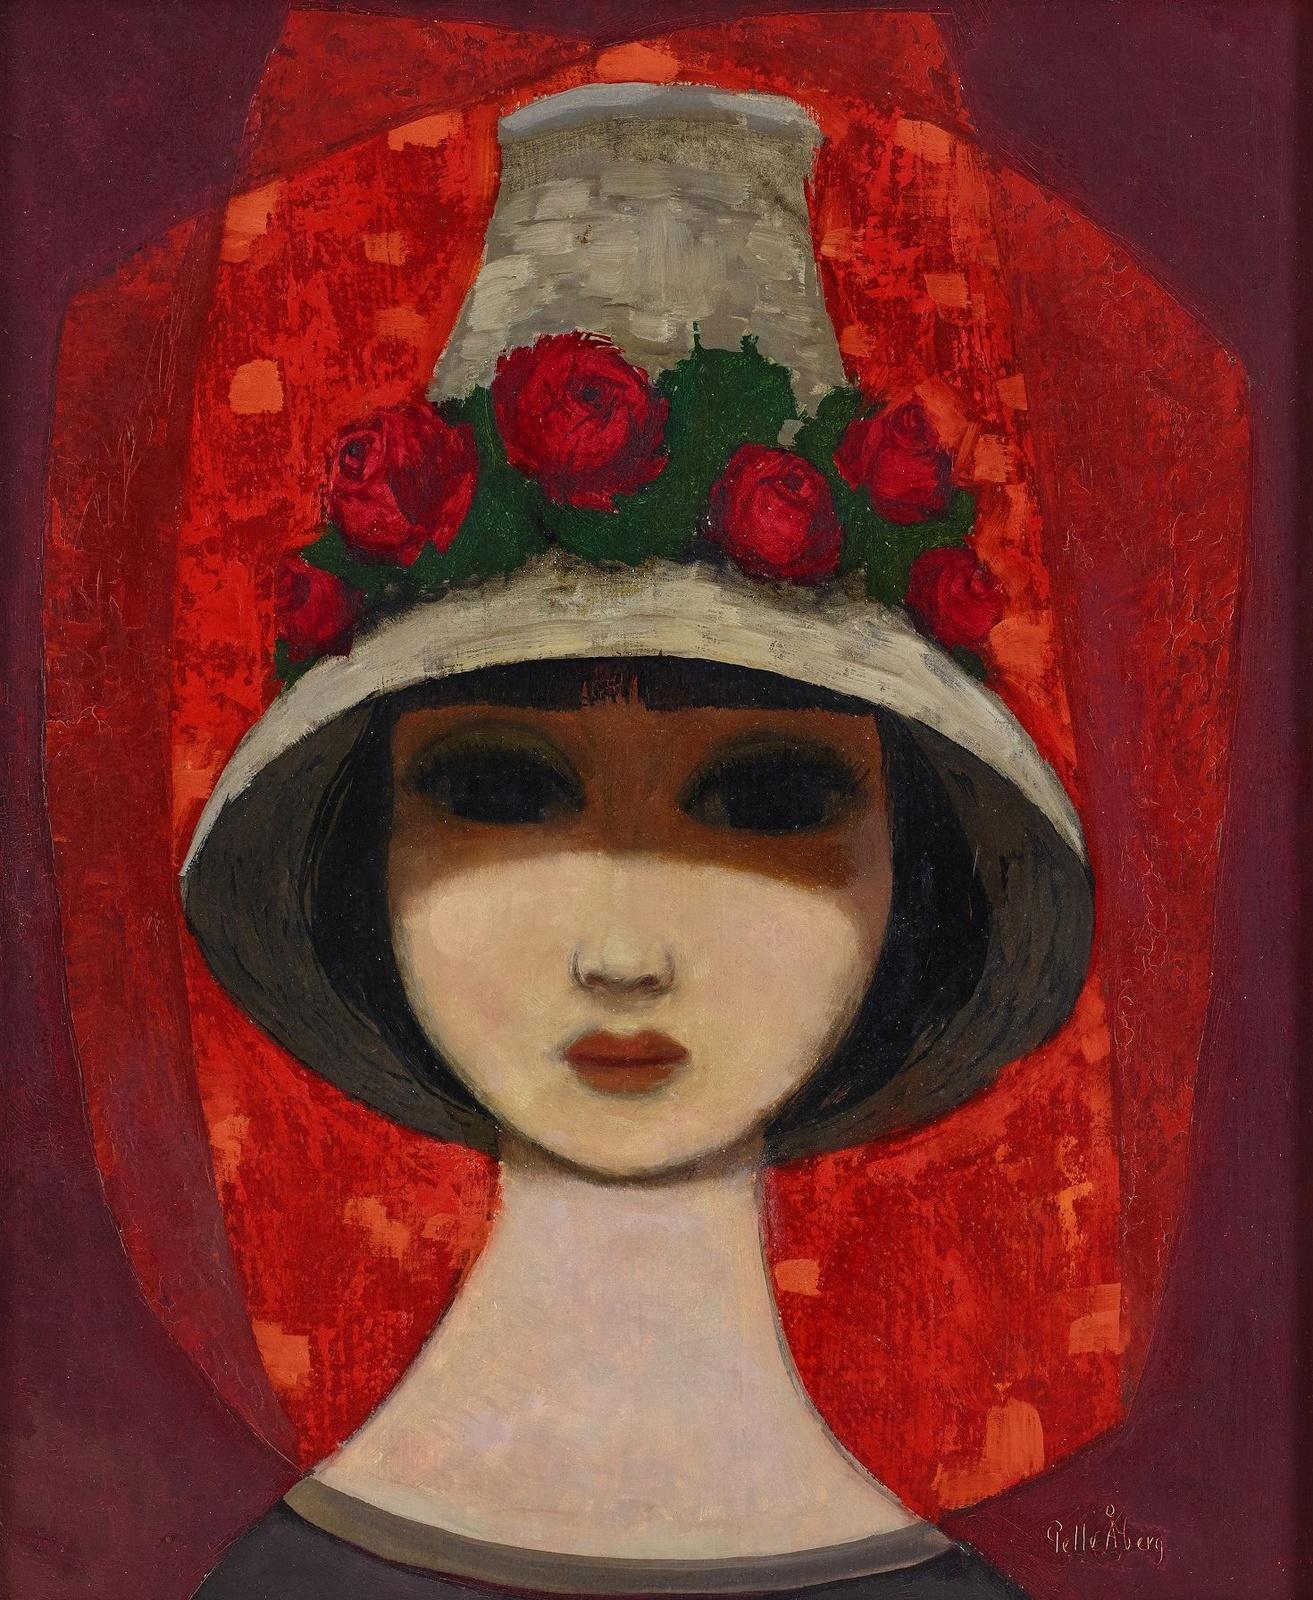 Девушка в шляпе с цветами (Girl with flower hat)_46 х 38_д.,м._Частное собрание.jpg